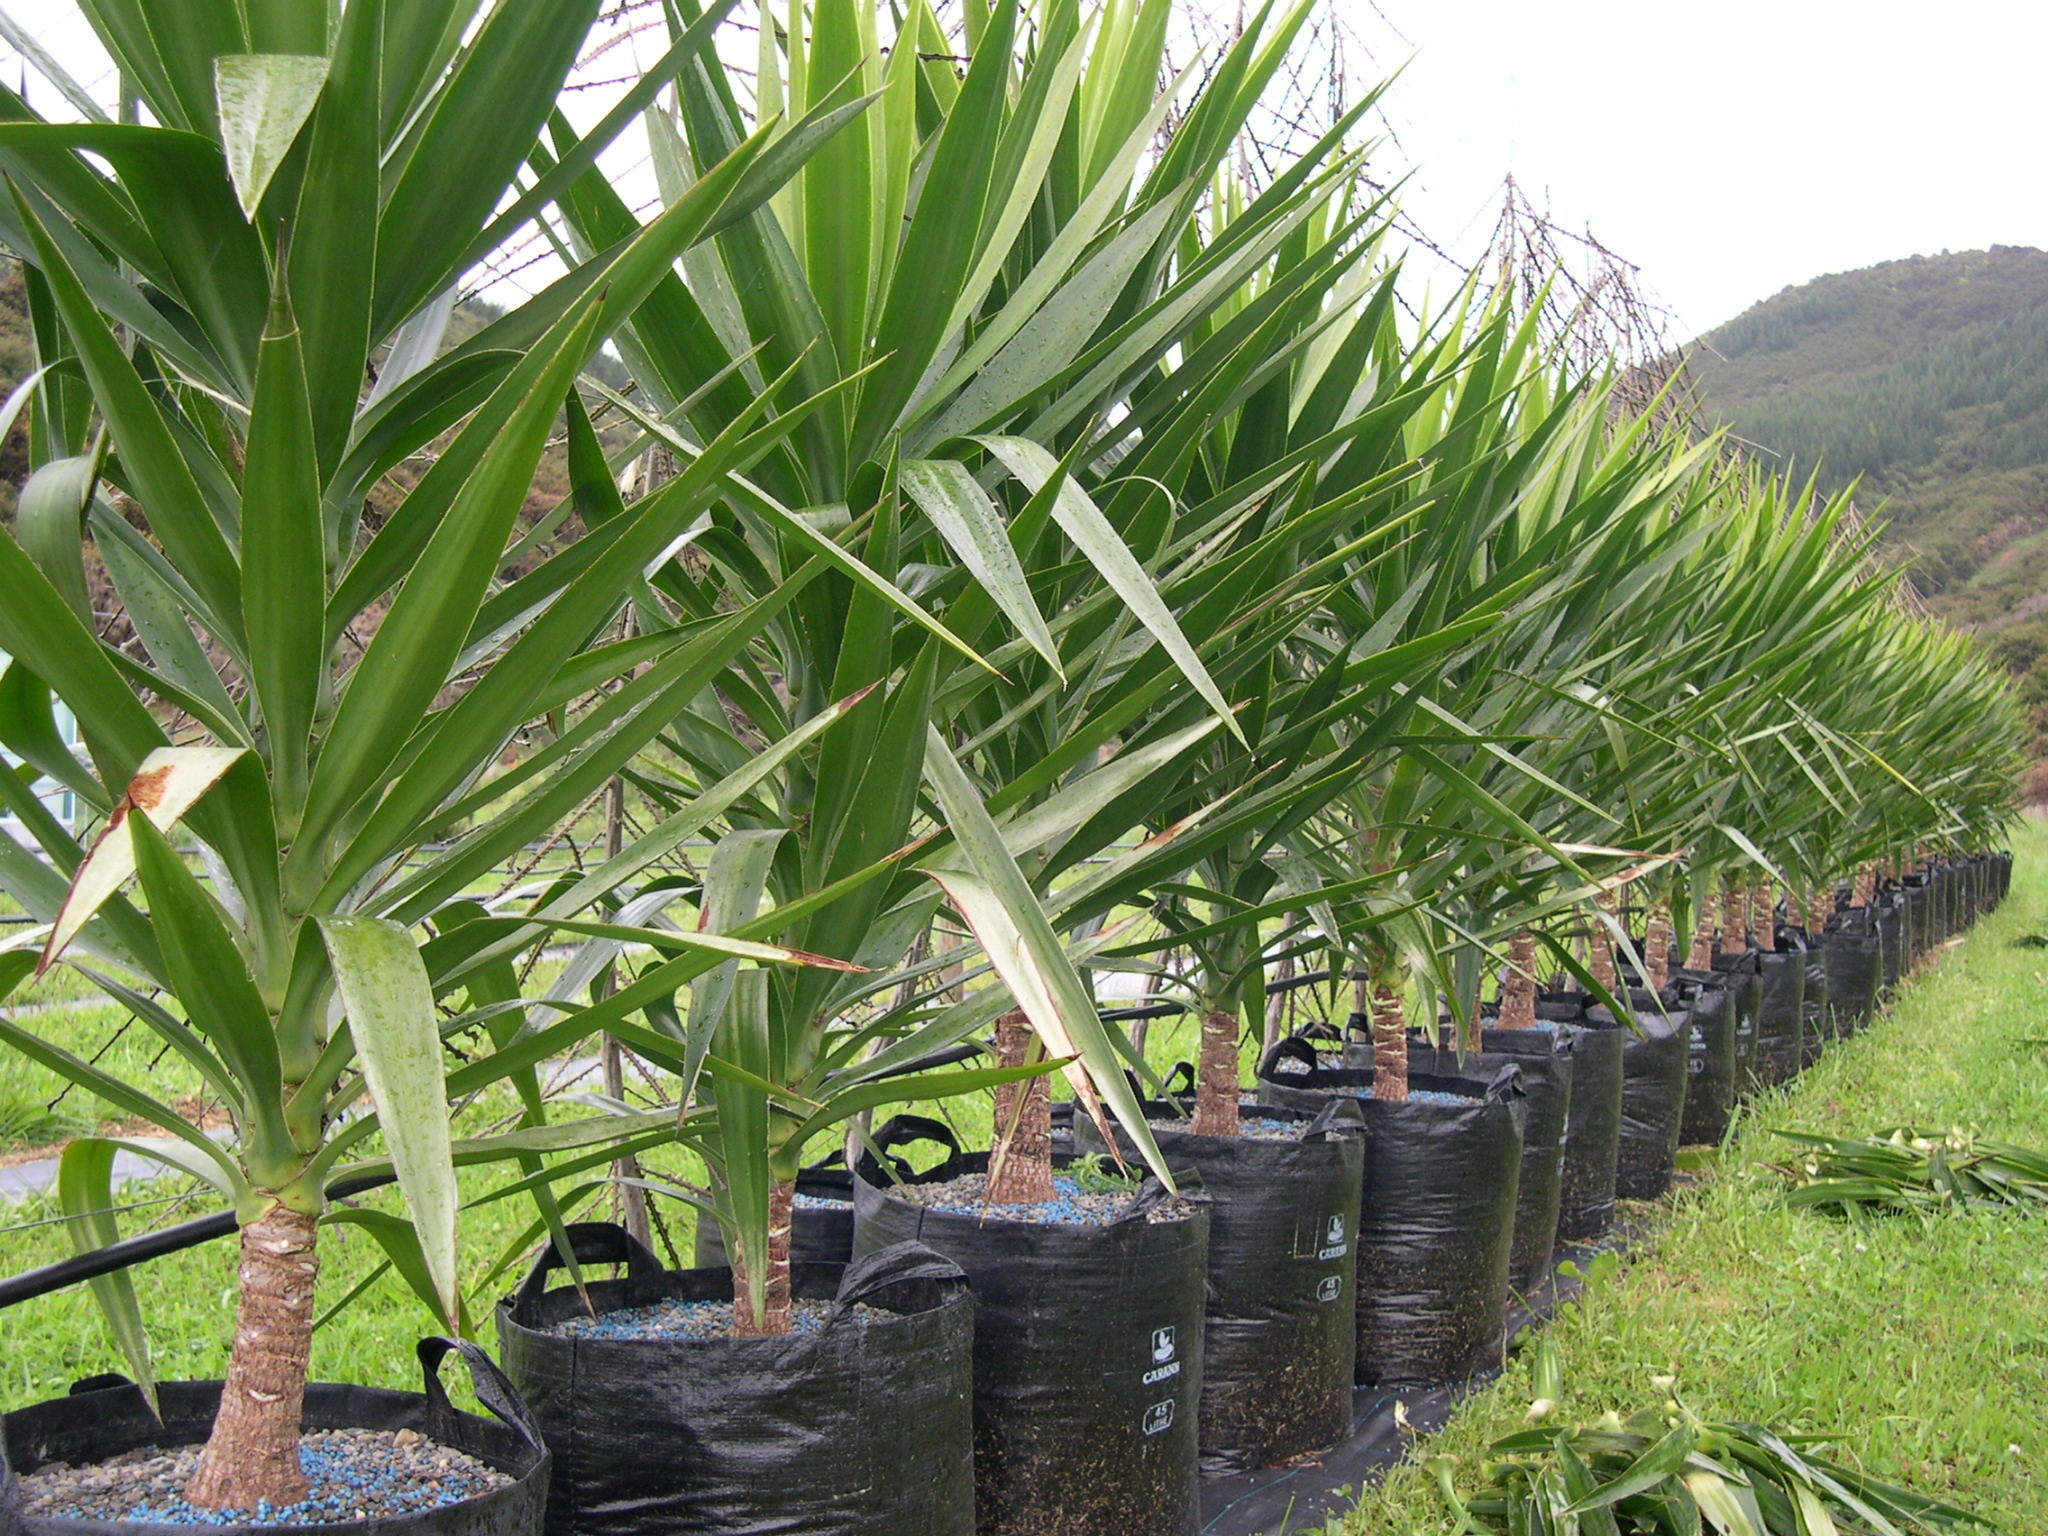 Bekannt Yucca elephantipes – impact plants UX02